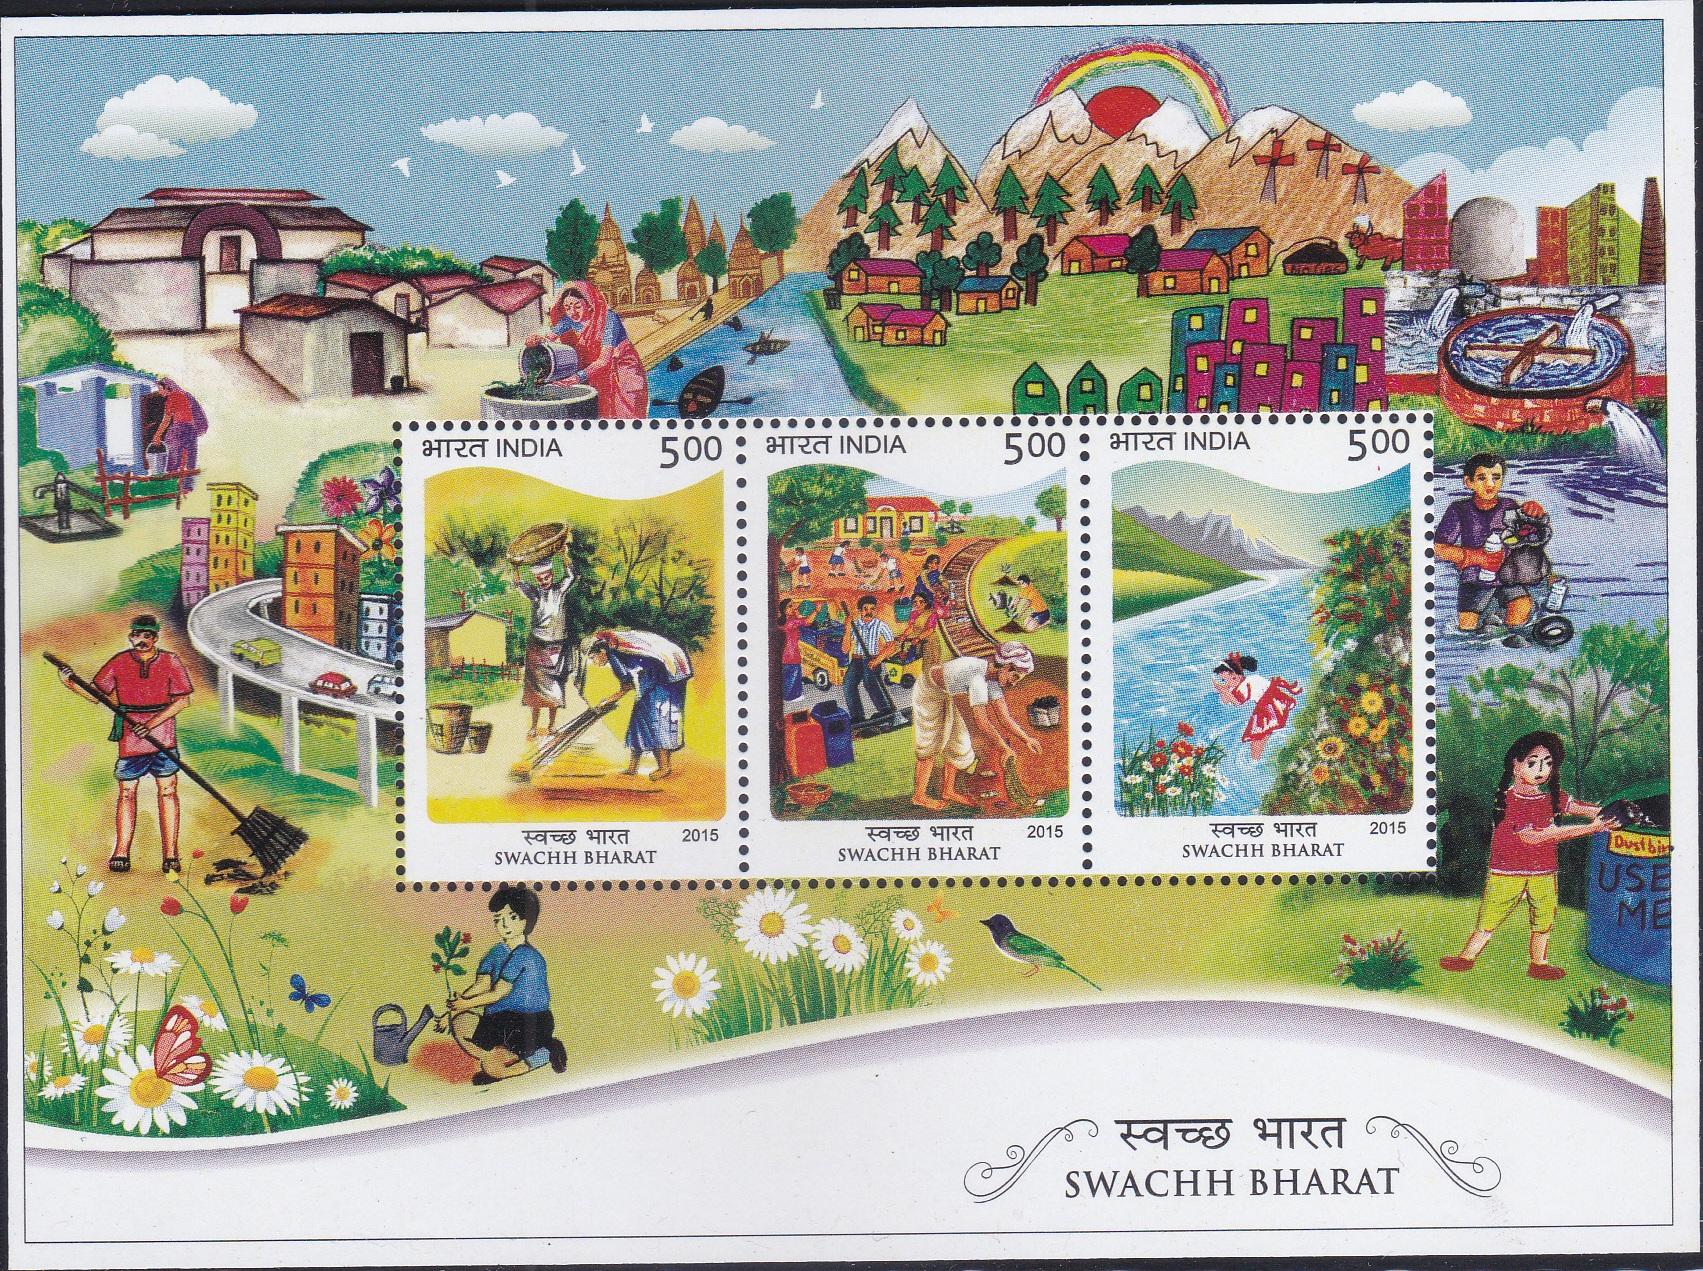 स्वच्छ भारत अभियान : Swachh Bharat Mission (SBM)